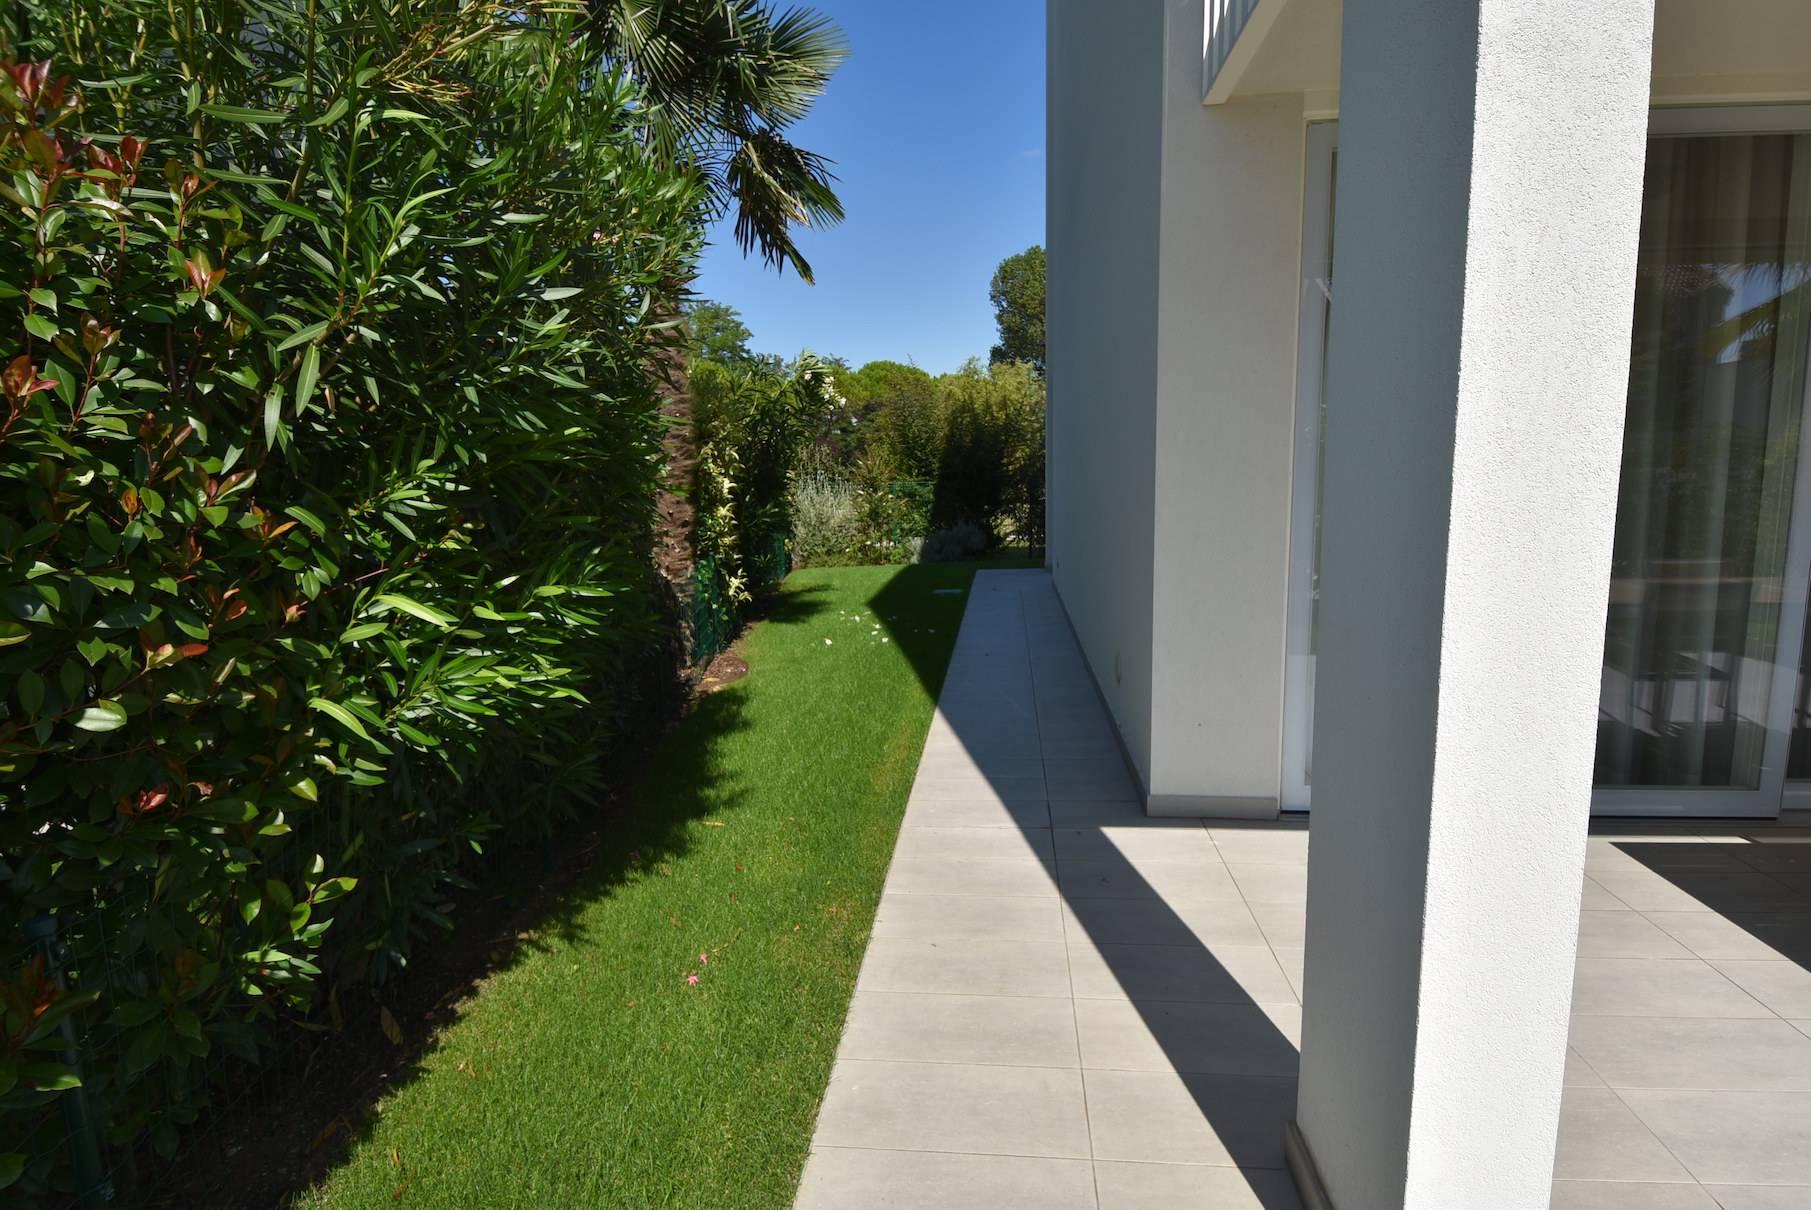 giardino-apartamento-1701559538